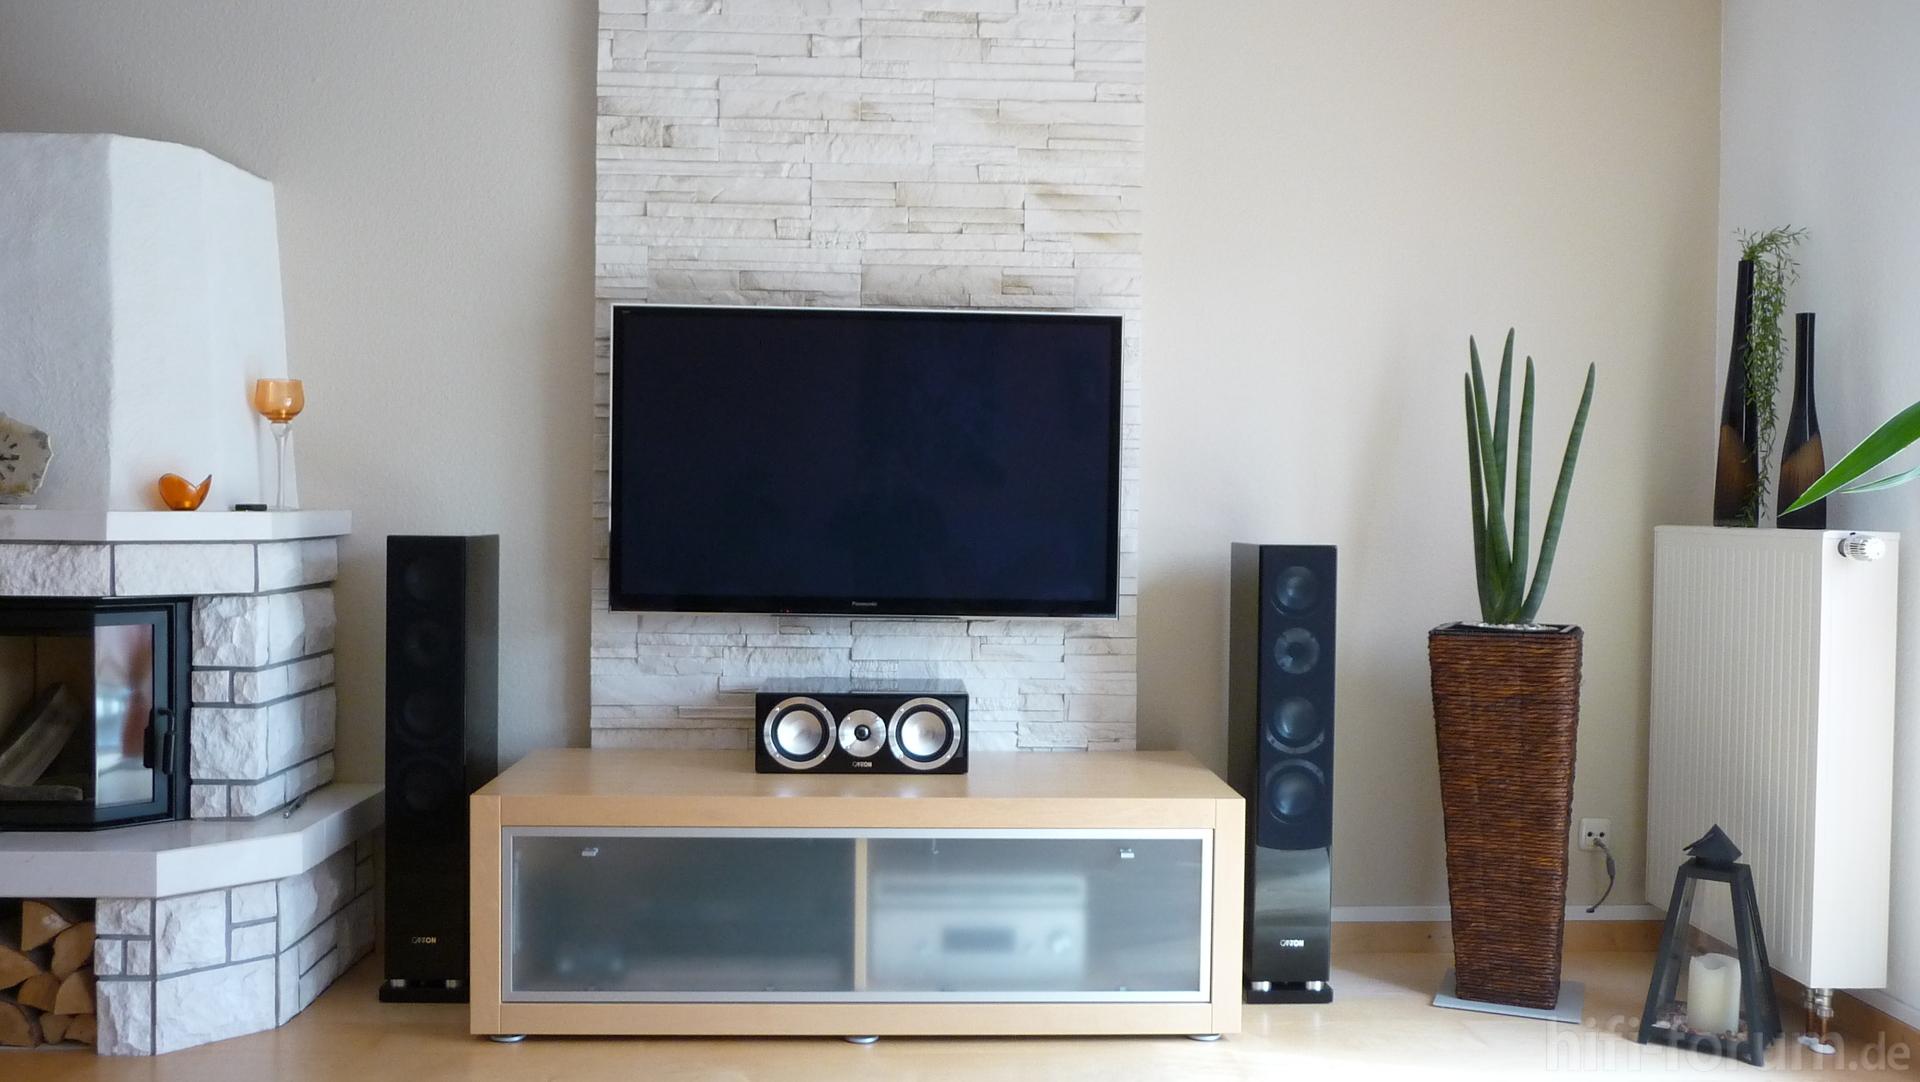 steinwand wohnzimmer hifi 2 images steinwand tapete. Black Bedroom Furniture Sets. Home Design Ideas